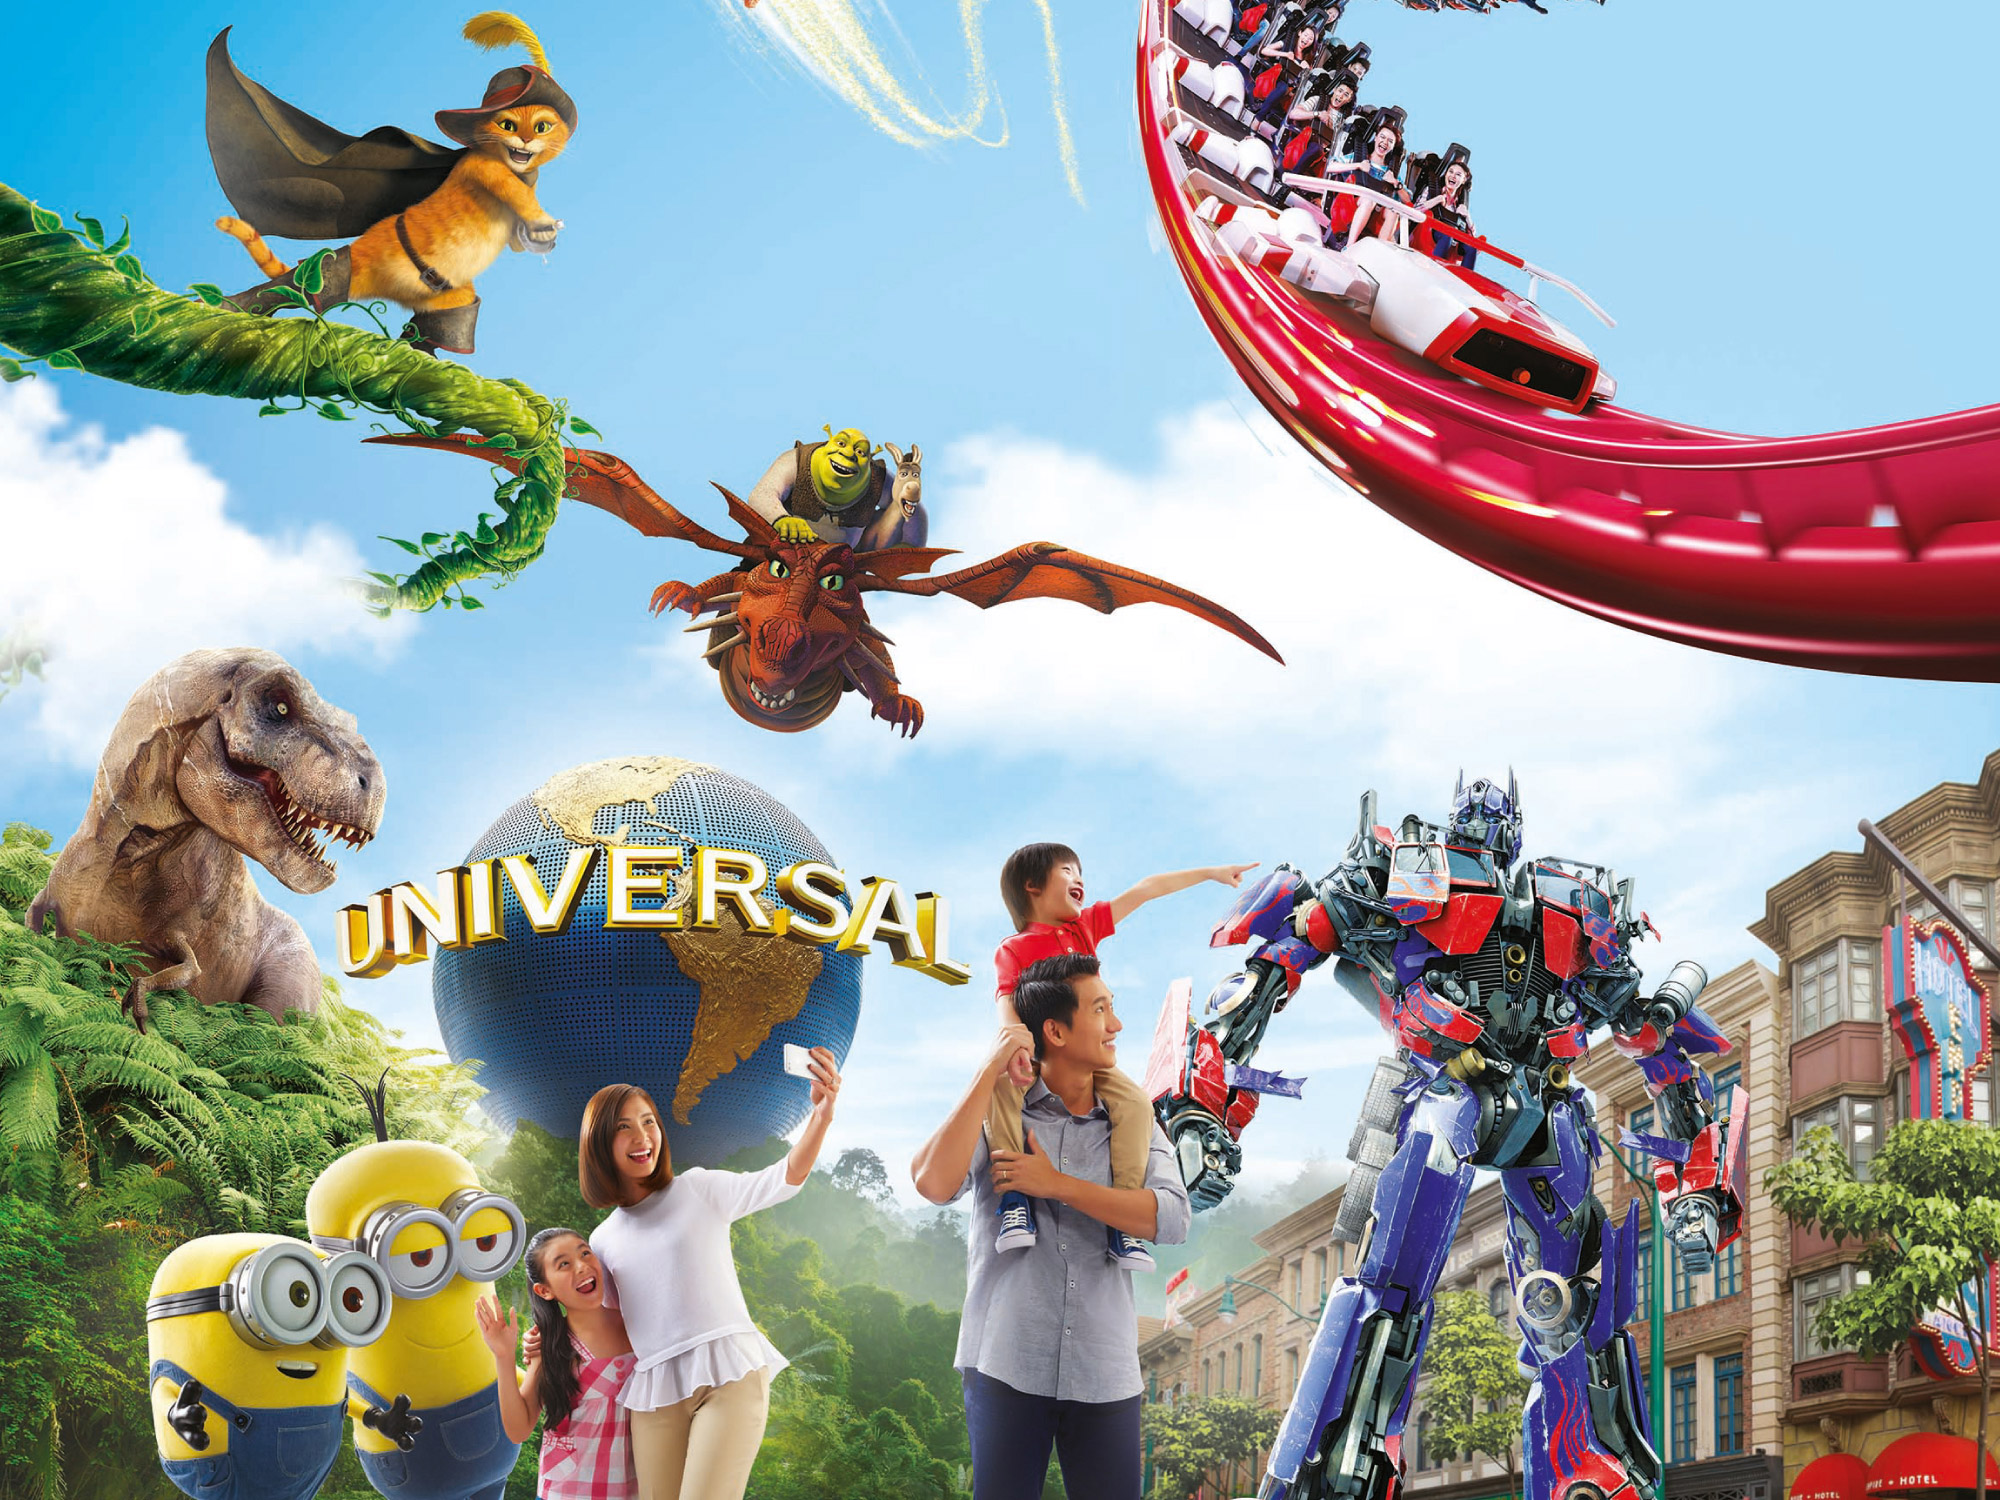 Universal Studios Singapore, Resorts World Sentosa